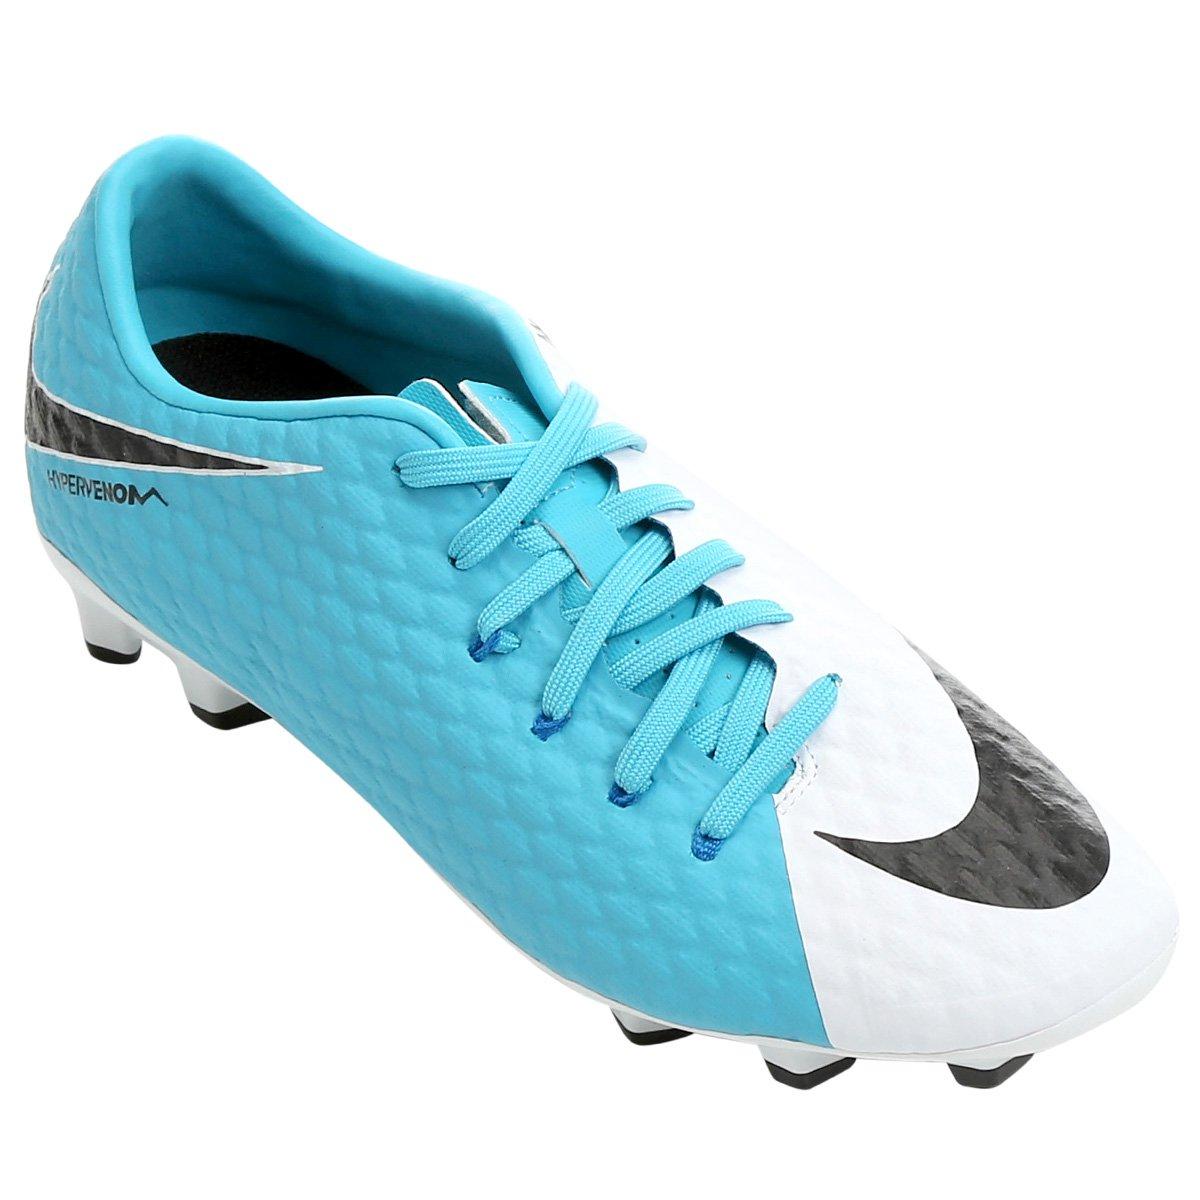 f475c717df23f Chuteira Campo Nike Hypervenom Phelon 3 FG | Loja do Inter